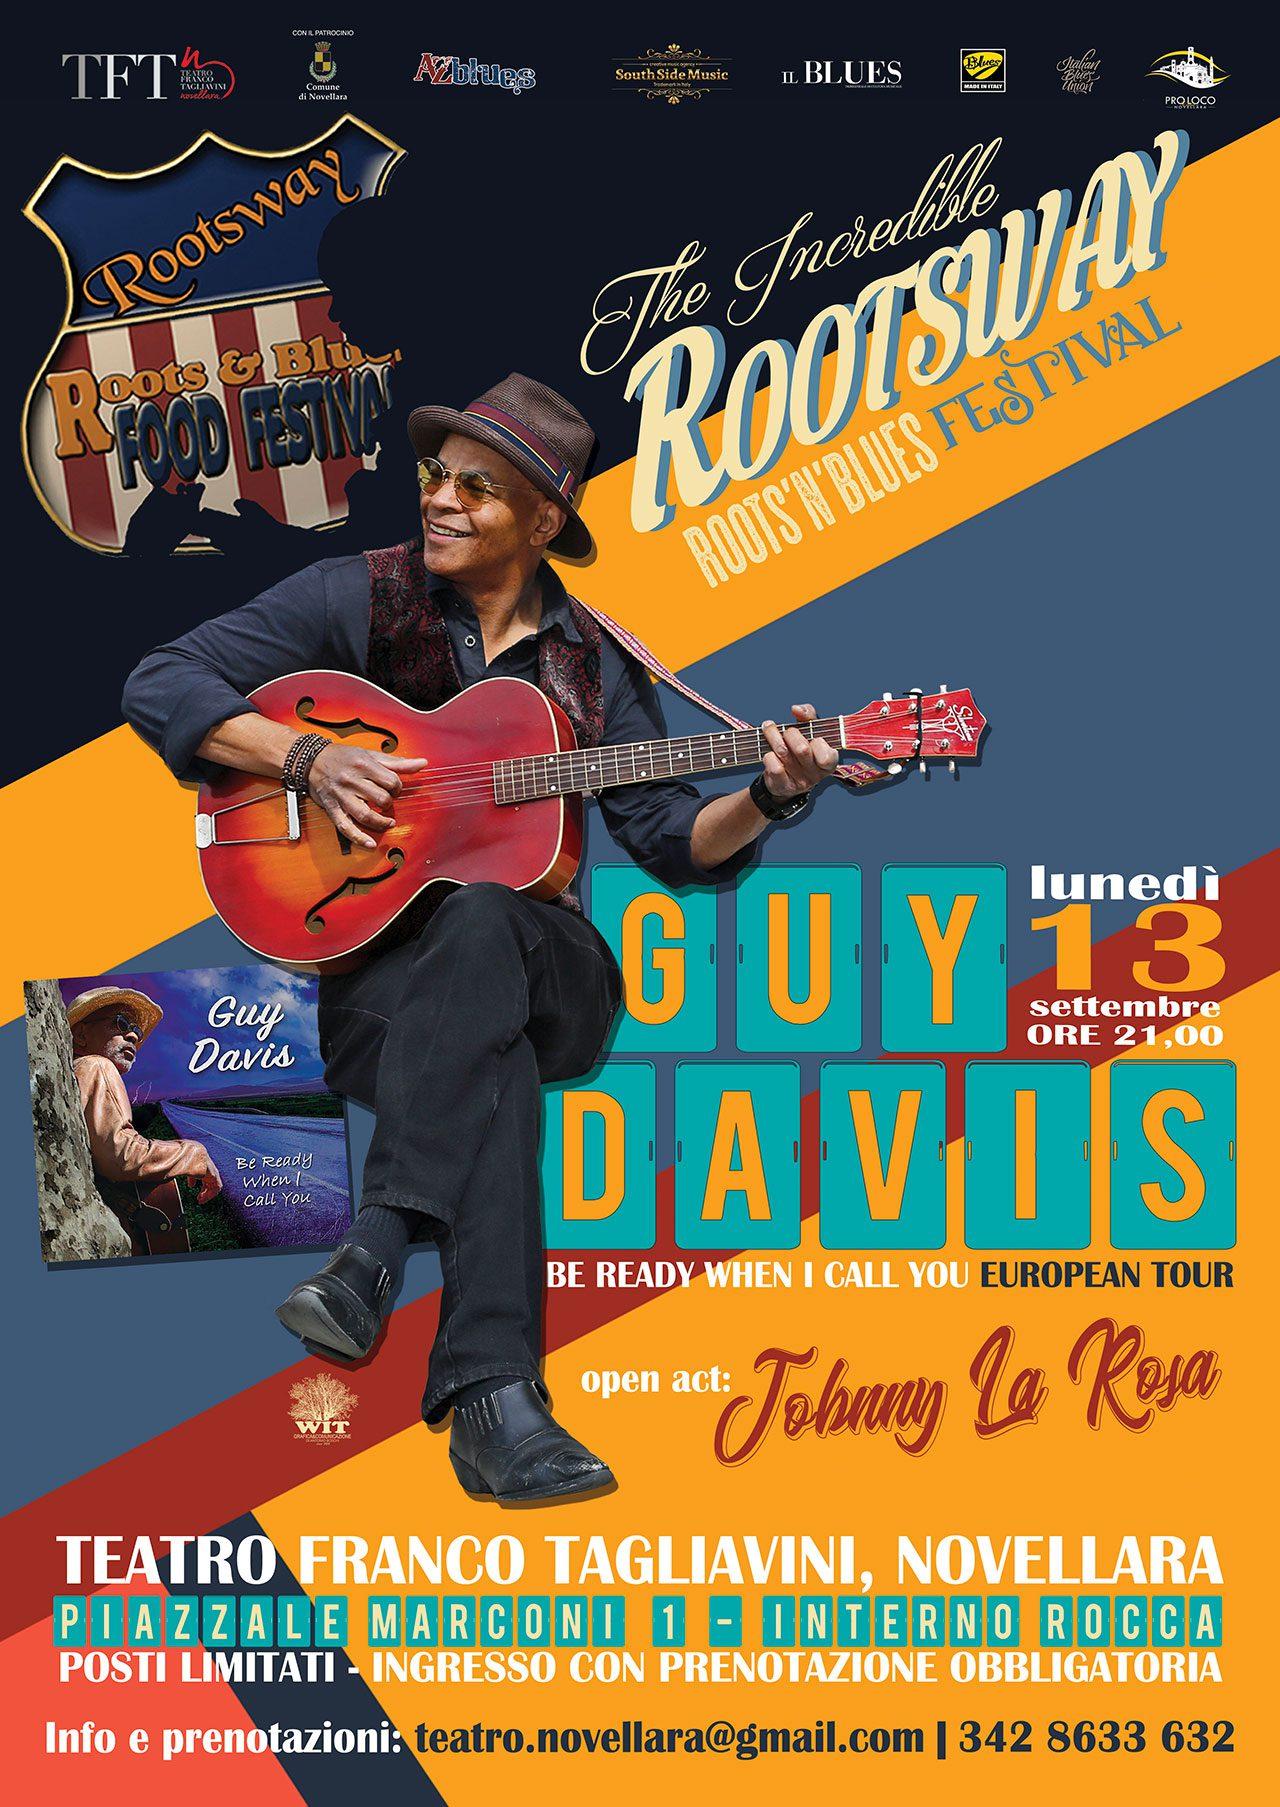 Rootsway presenta Guy Davis in concerto